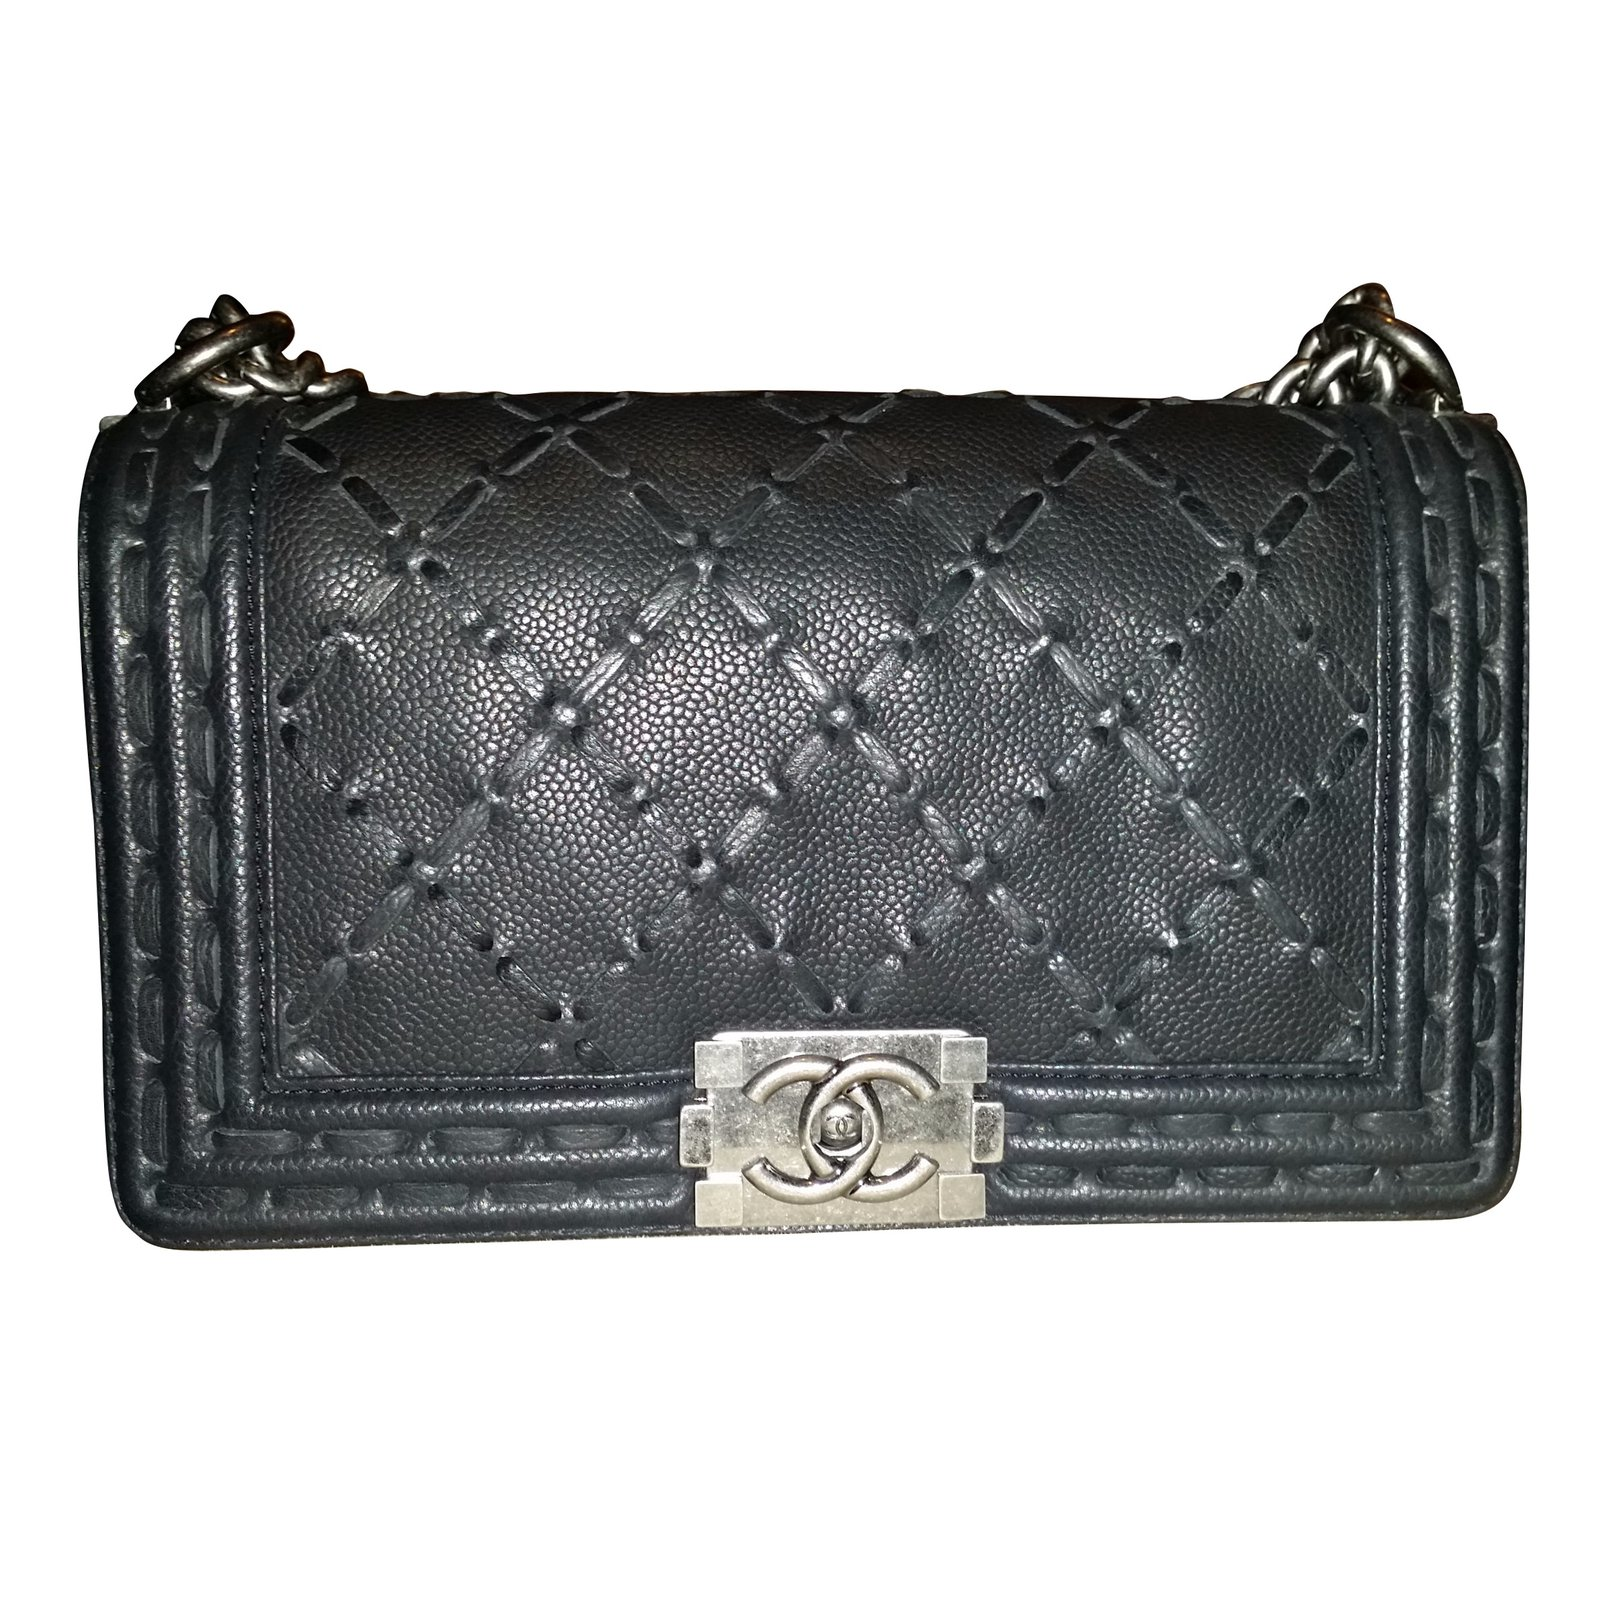 Chanel Handbags Leather Black Ref 10947 Joli Closet